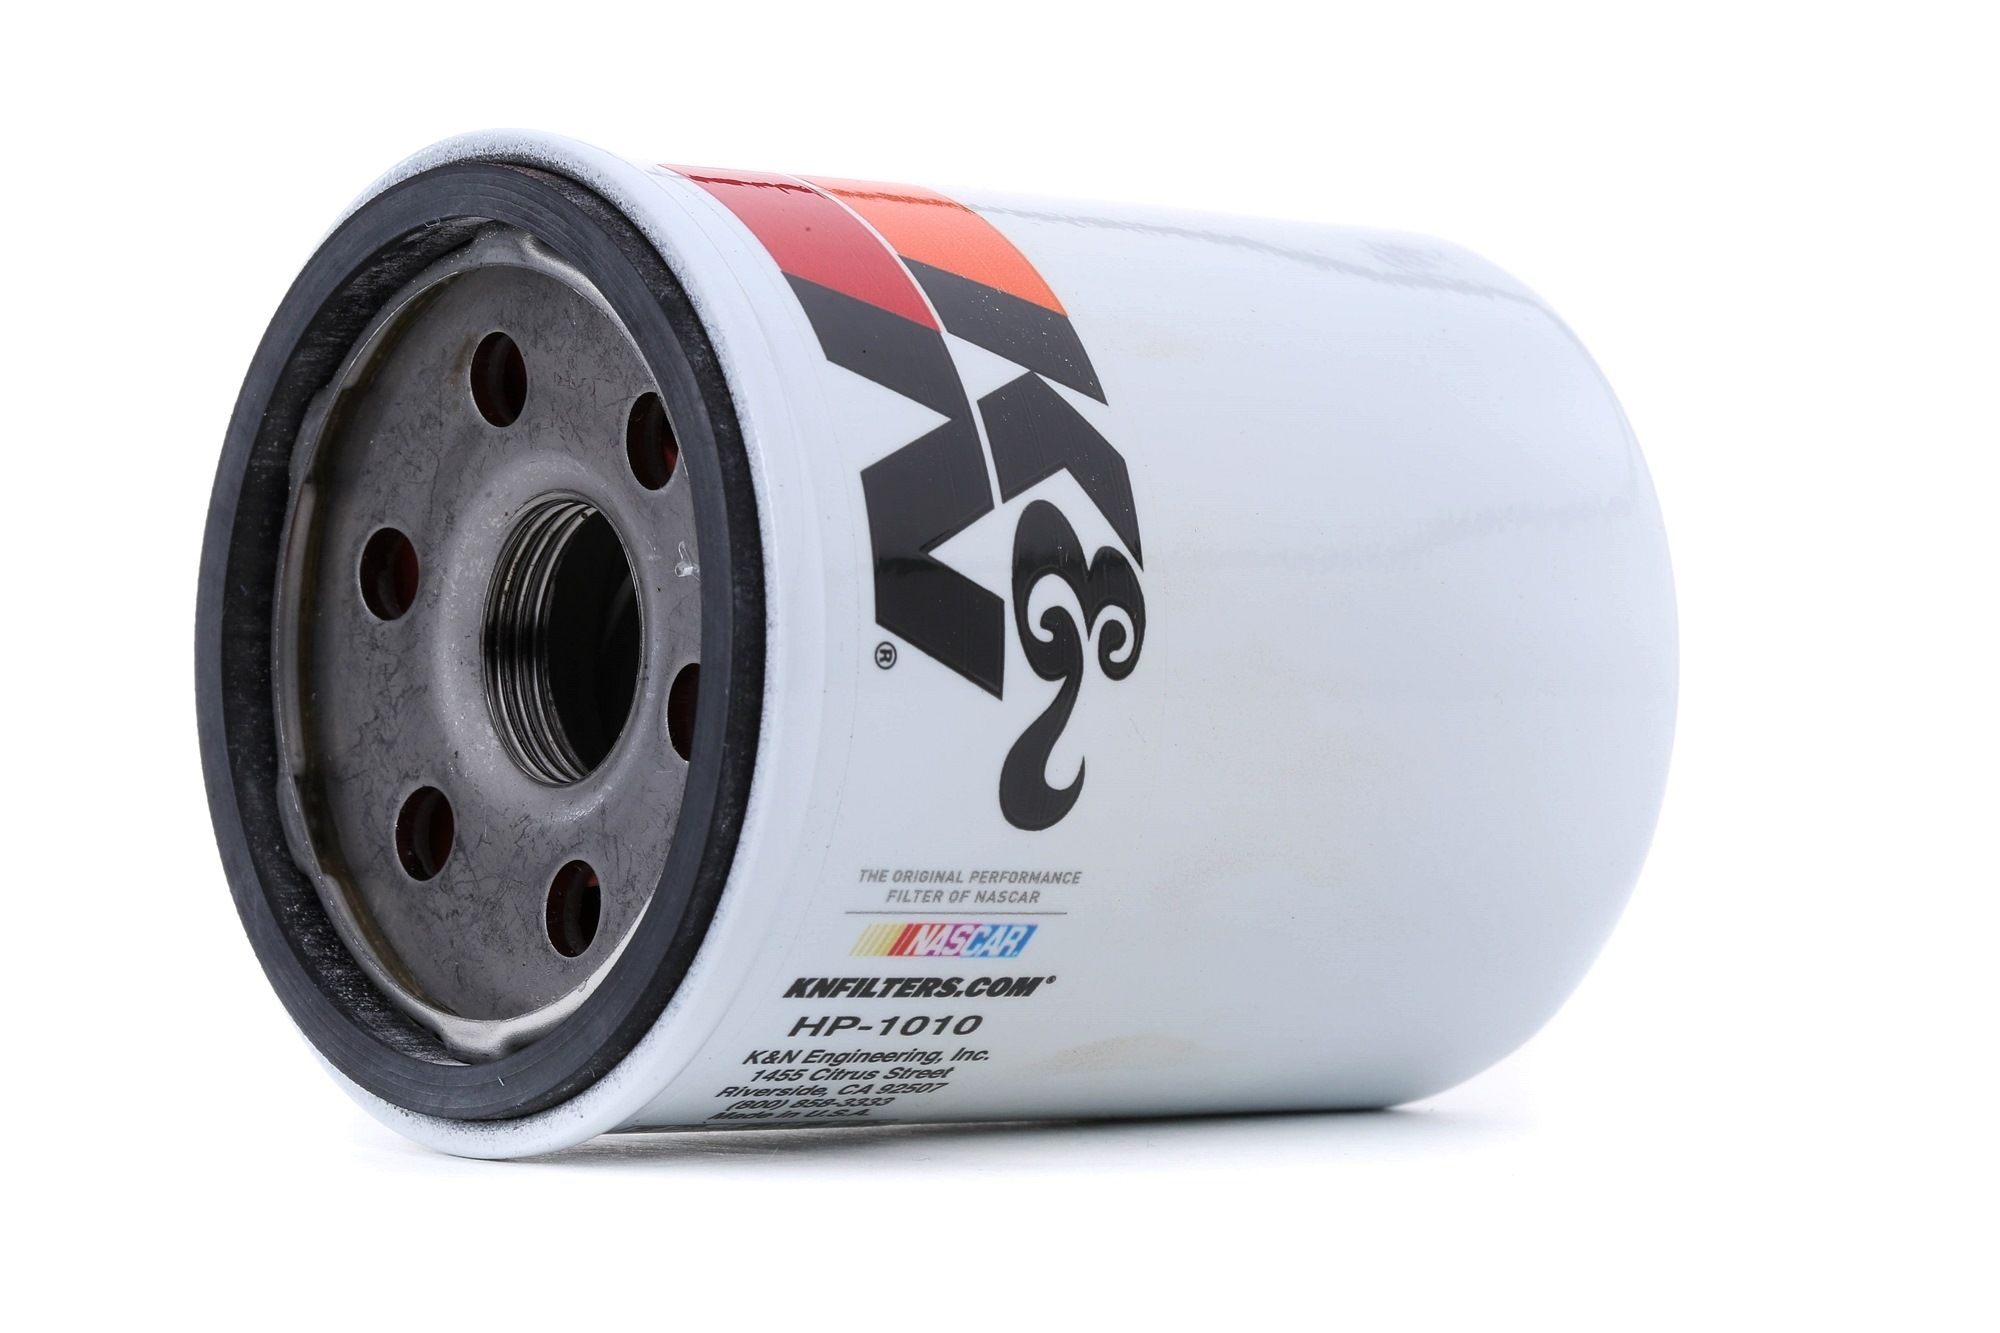 Engine oil filter K&N Filters HP-1010 rating